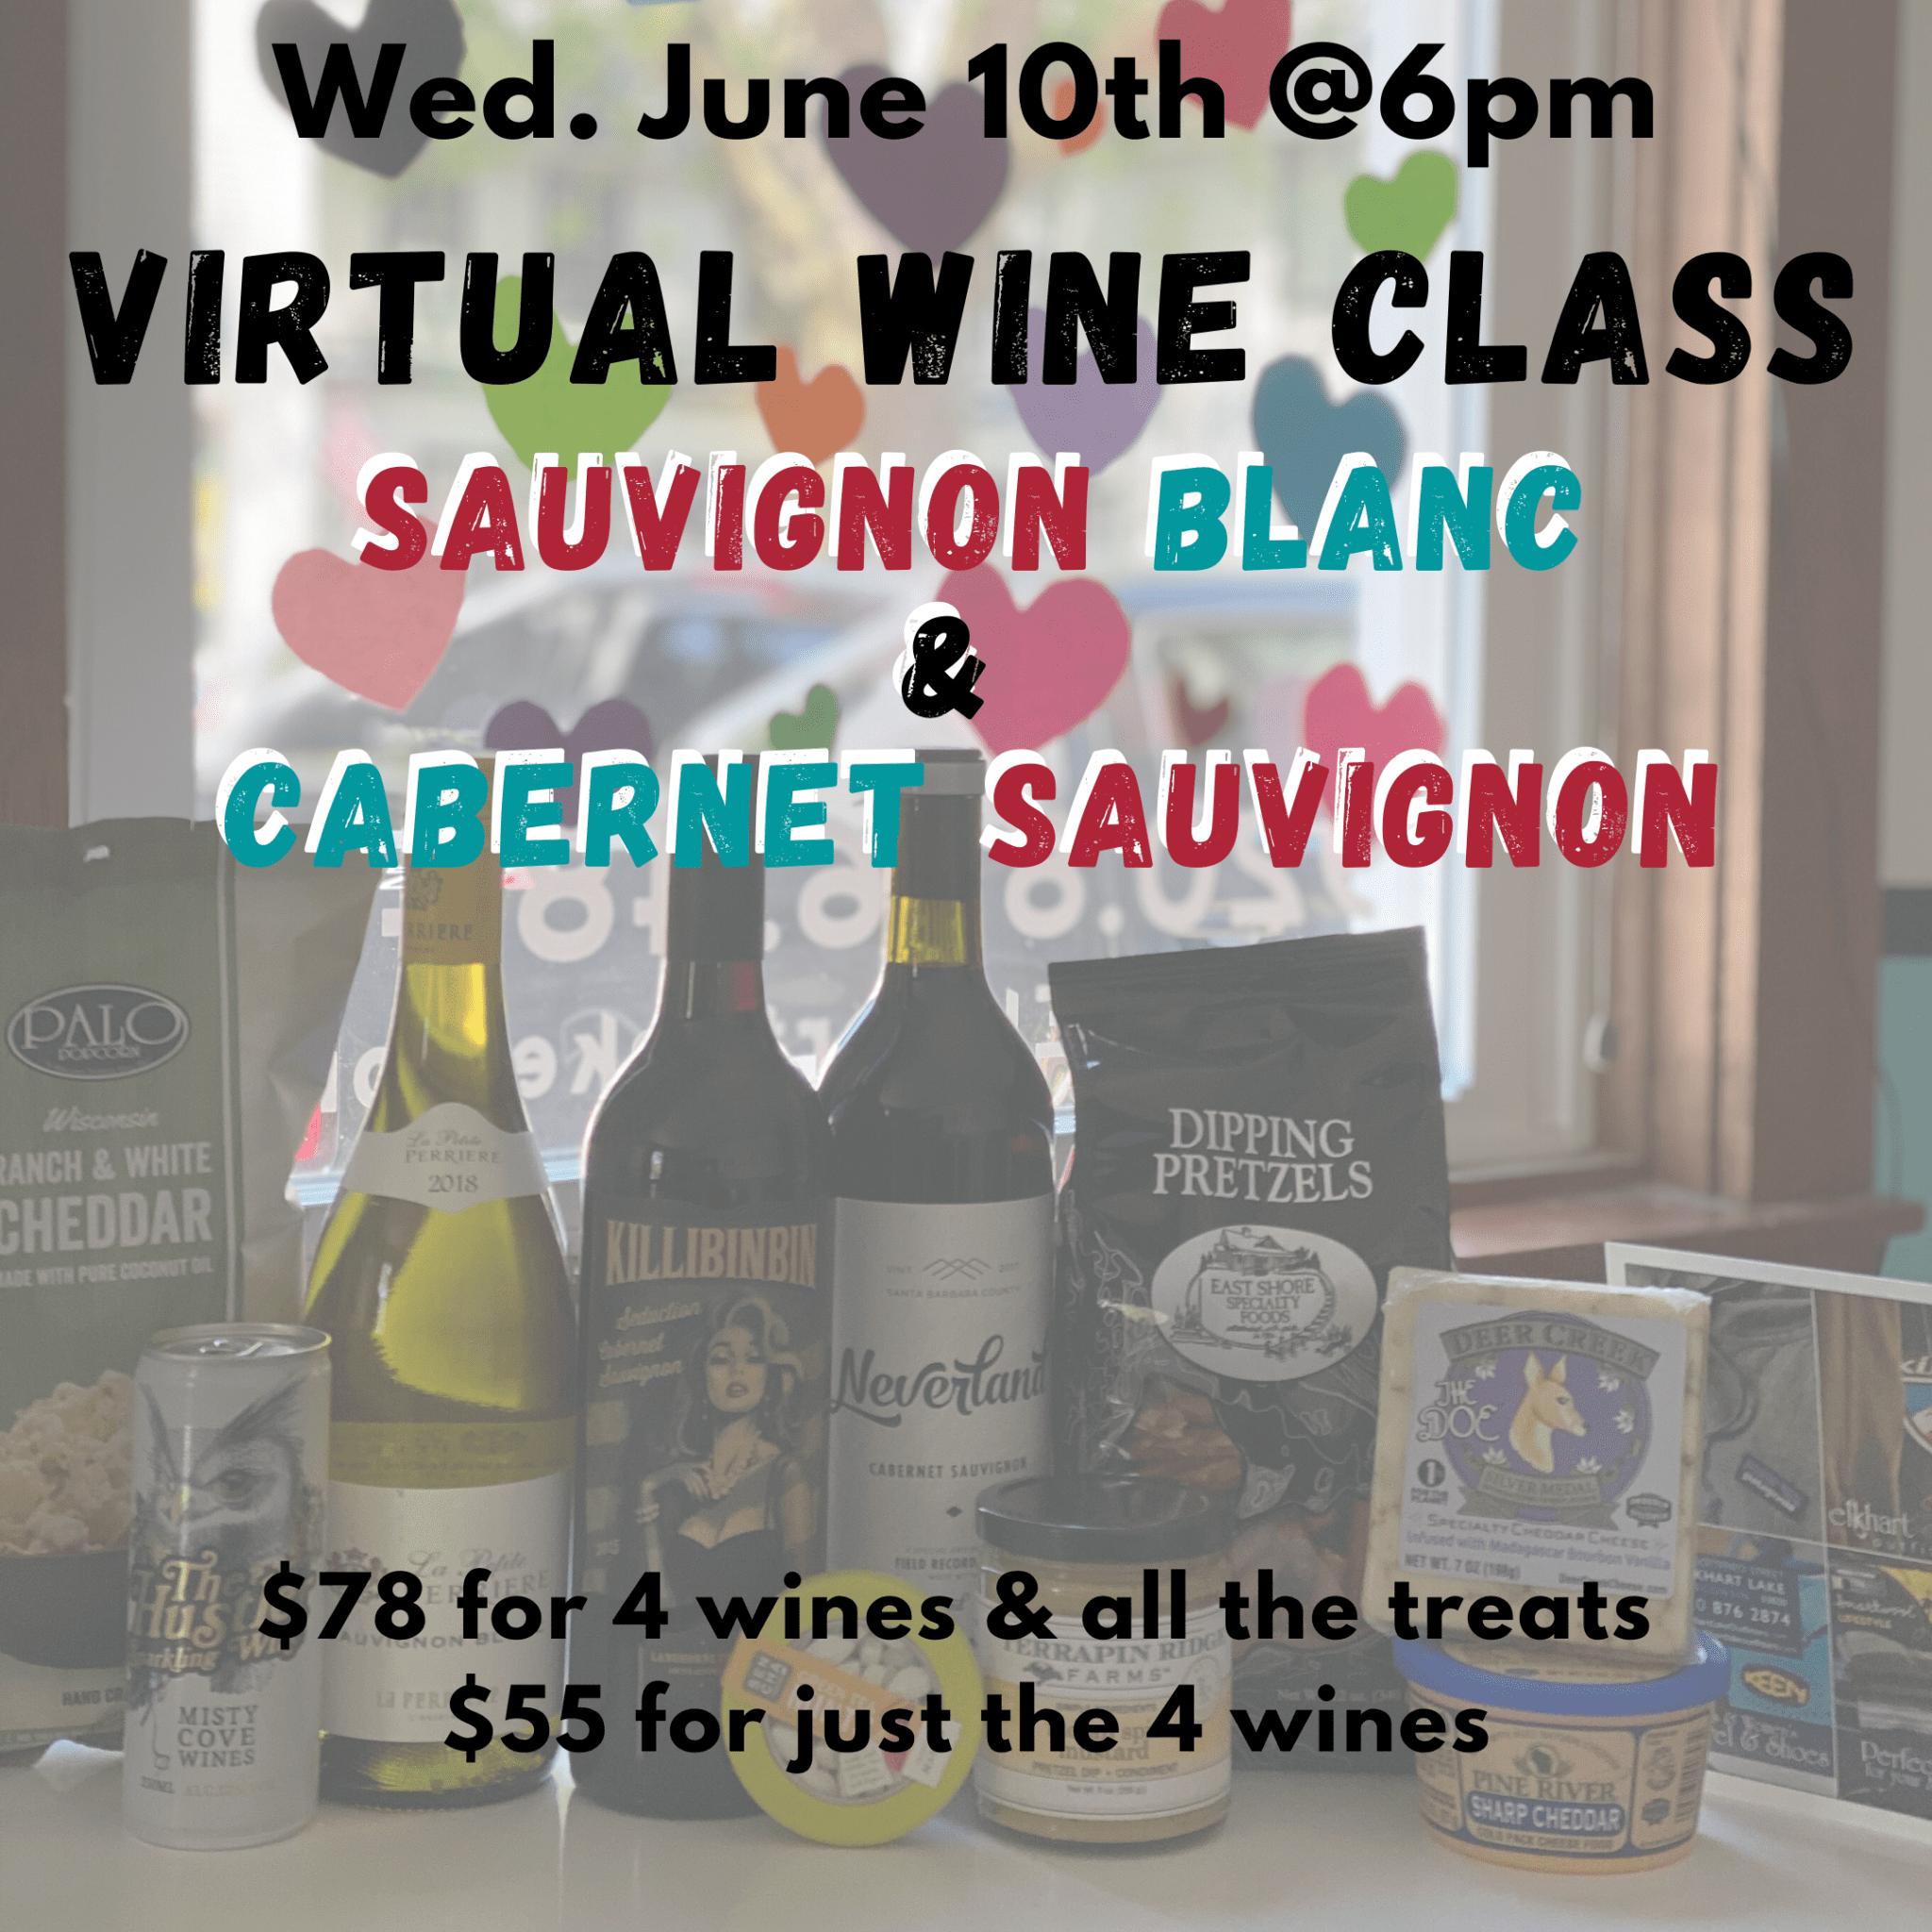 June 10th Virtual Tasting Pack: Sauvignons - Cabernet Sauvignon & Sauvignon Blanc (wine only)